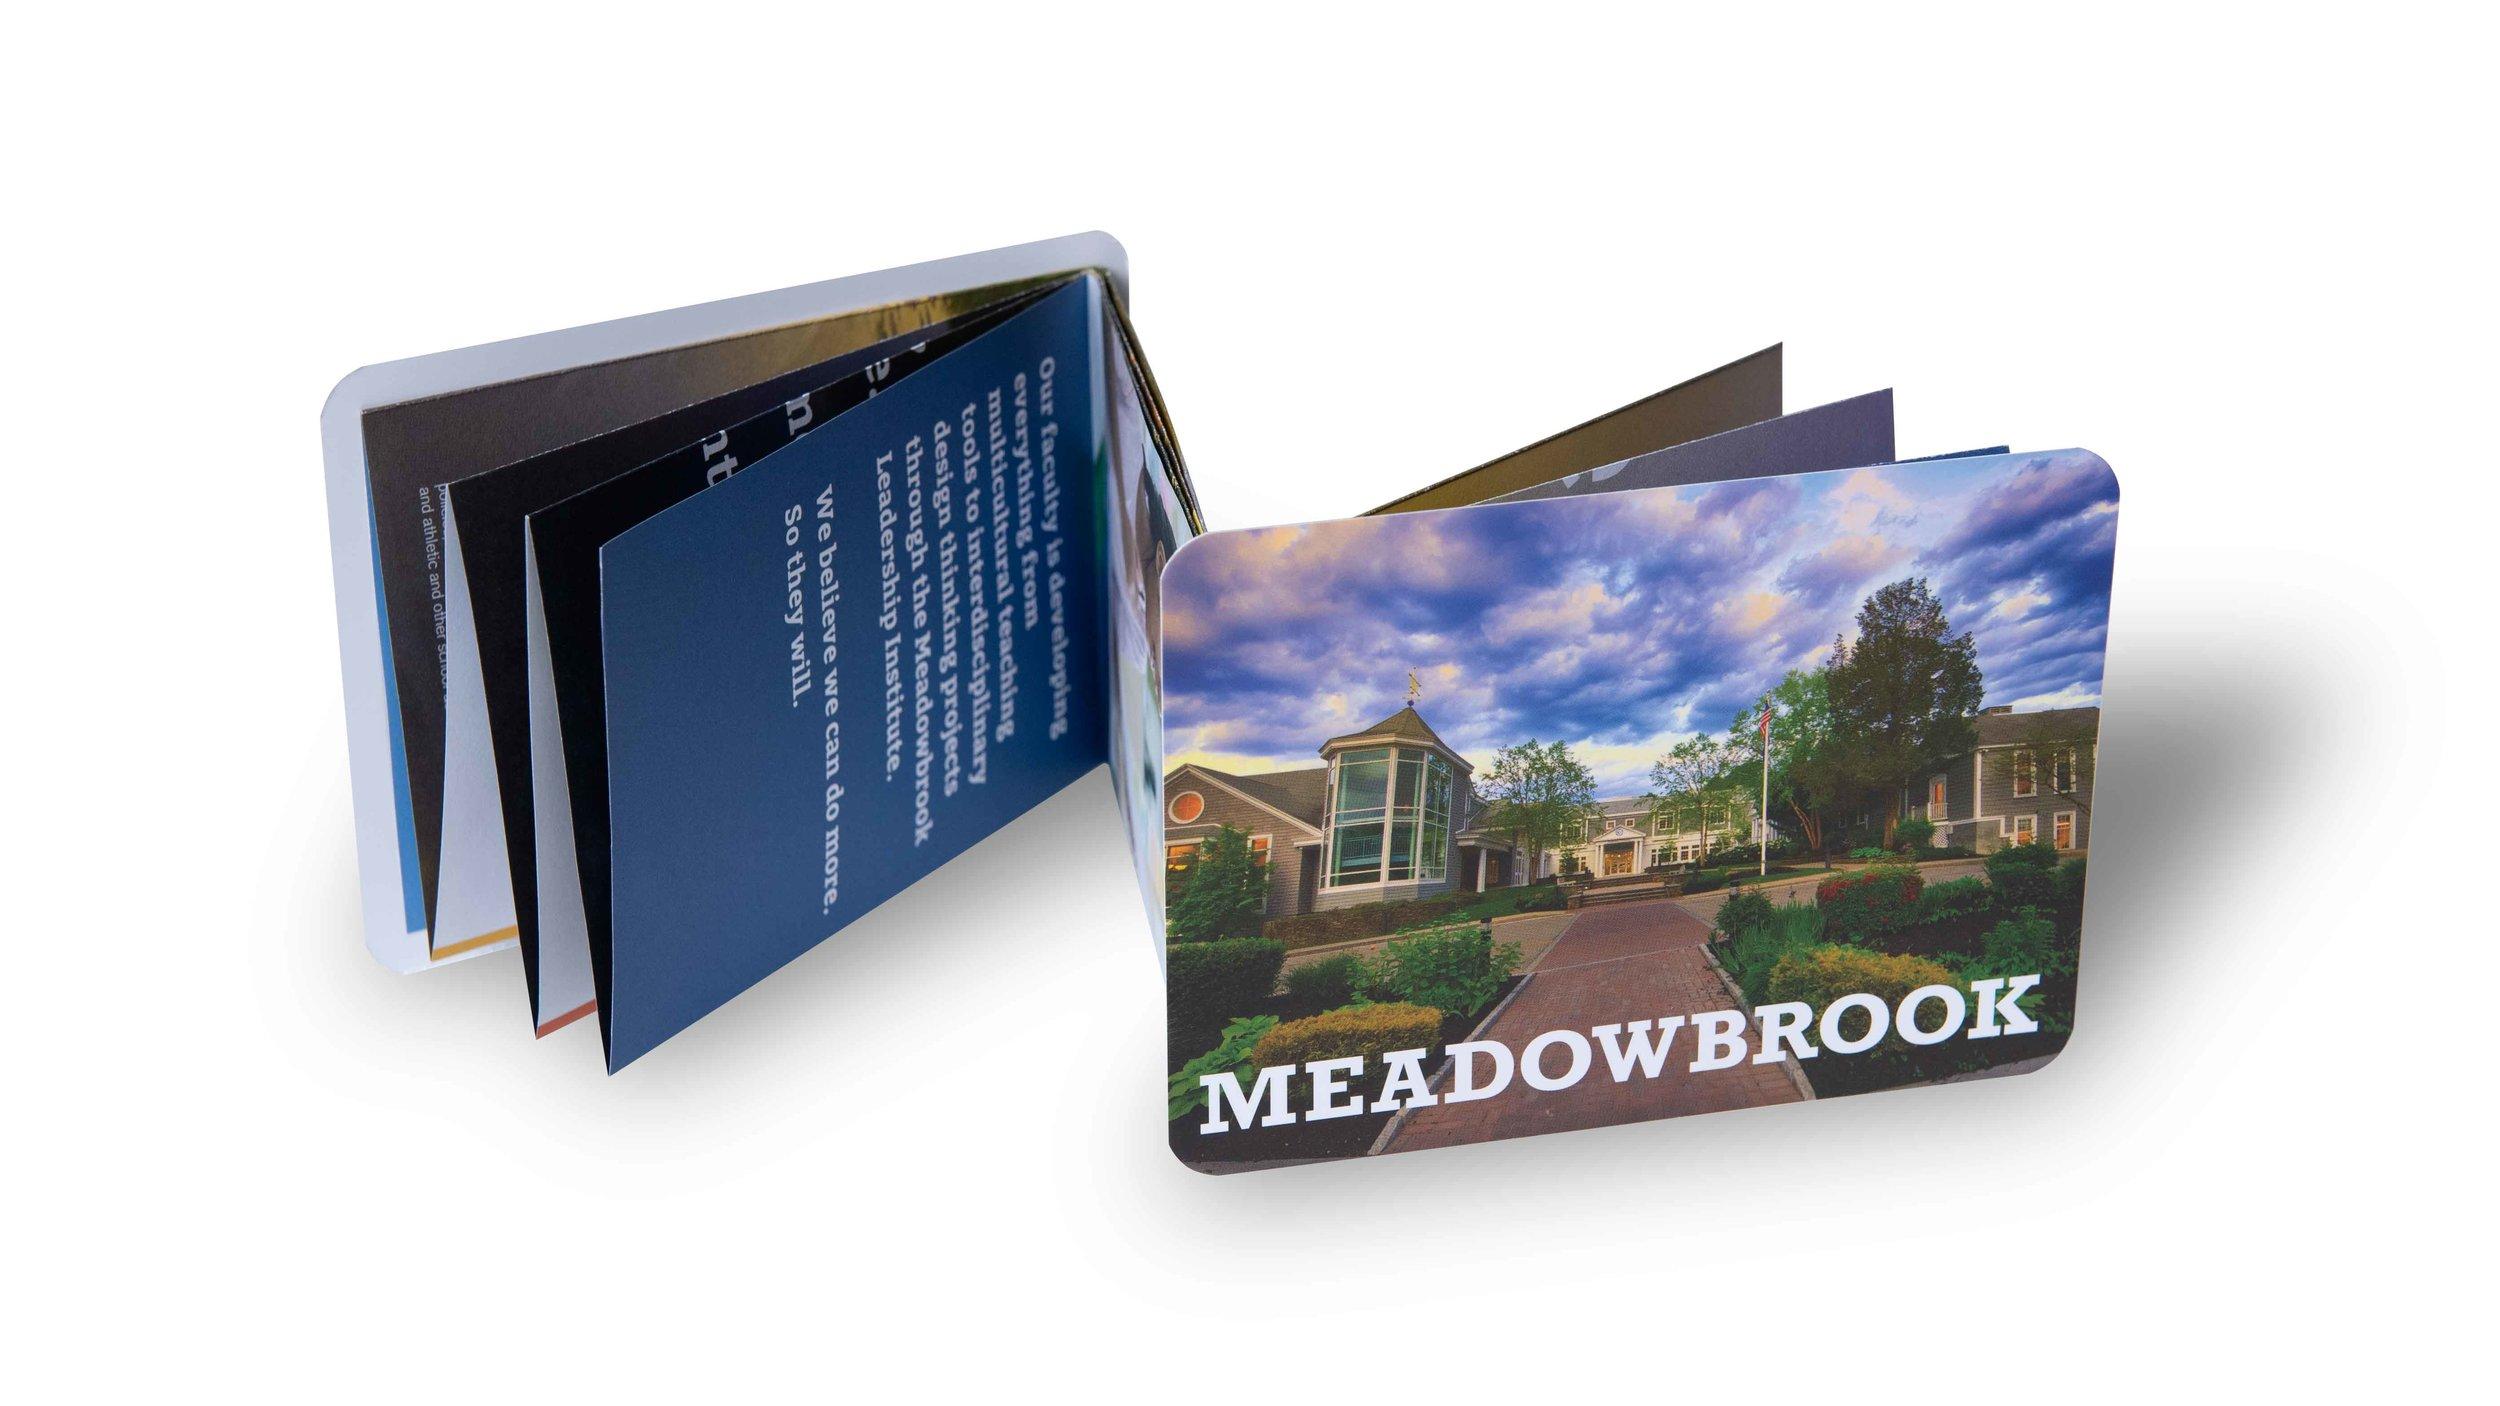 Meadowbrook-School-Creosote-Affects-Travel-Brochure.jpg